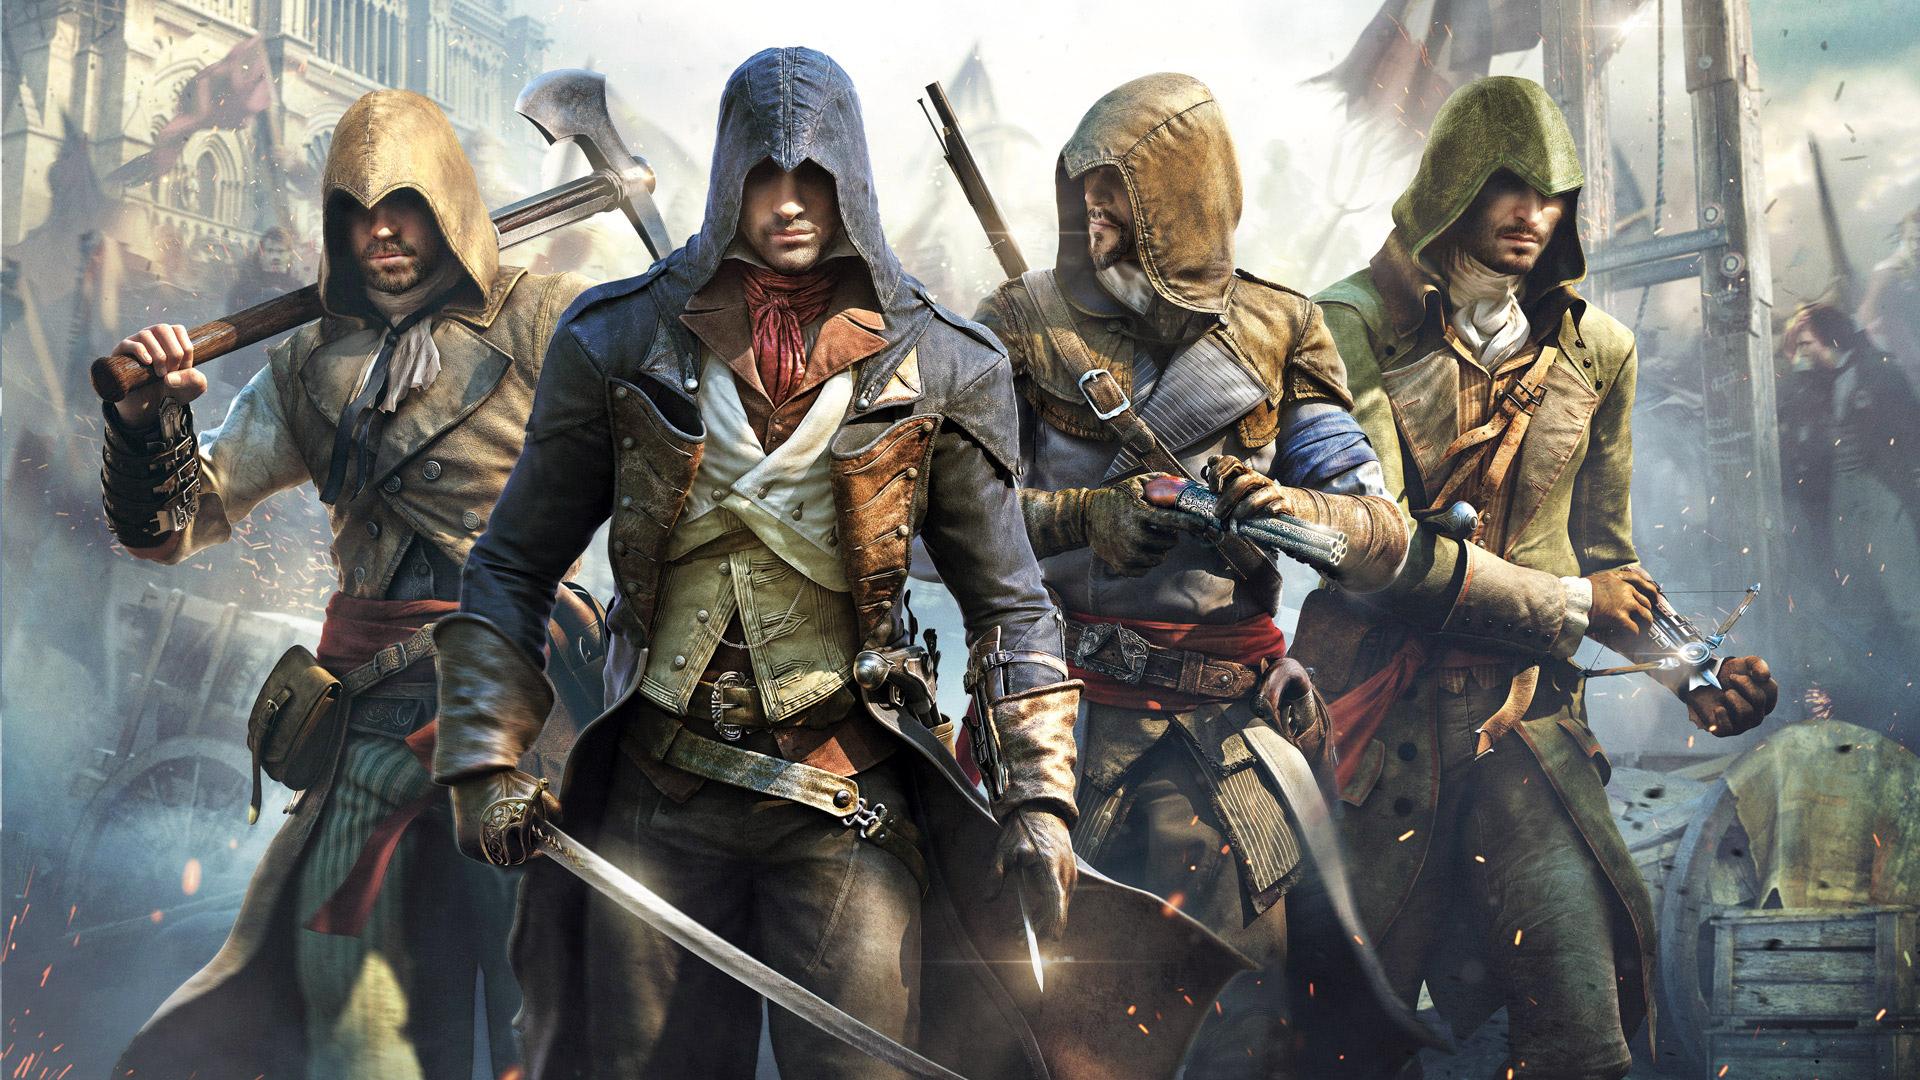 45 Assassin S Creed Unity Wallpaper 1080p On Wallpapersafari